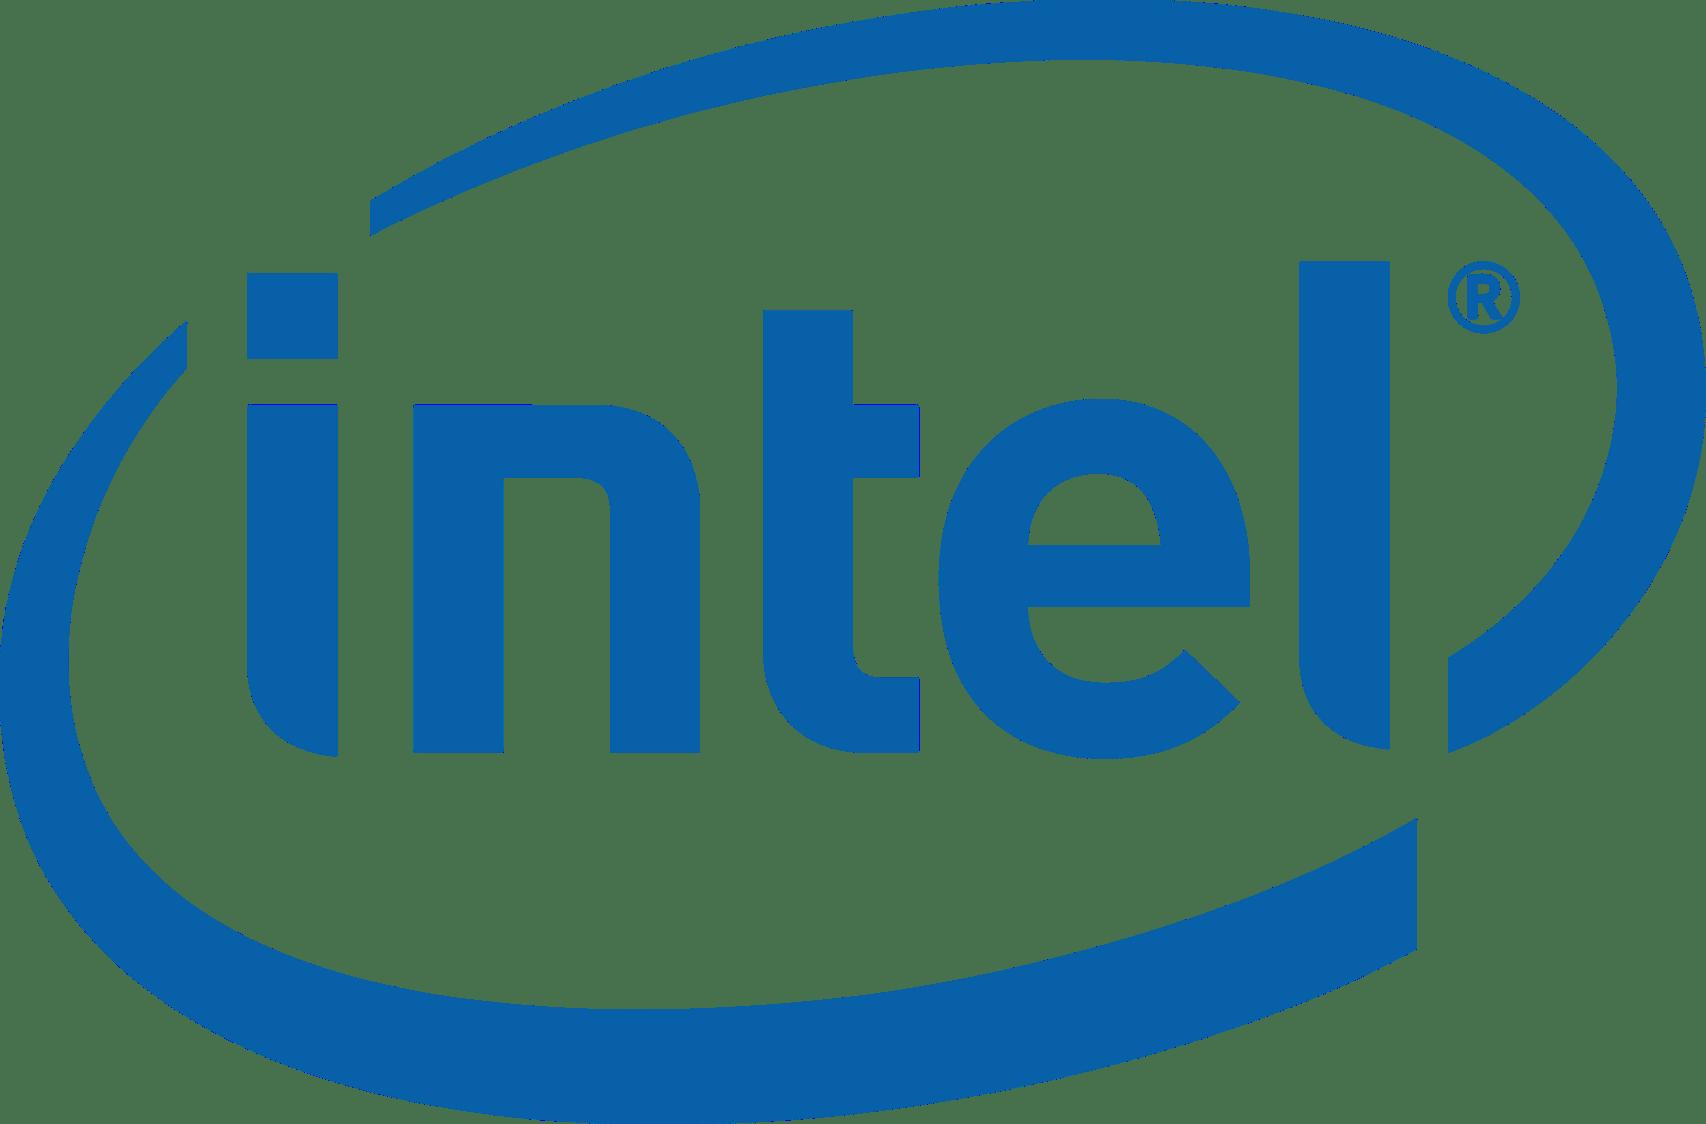 Intel Wave Analysis – 29 October, 2019